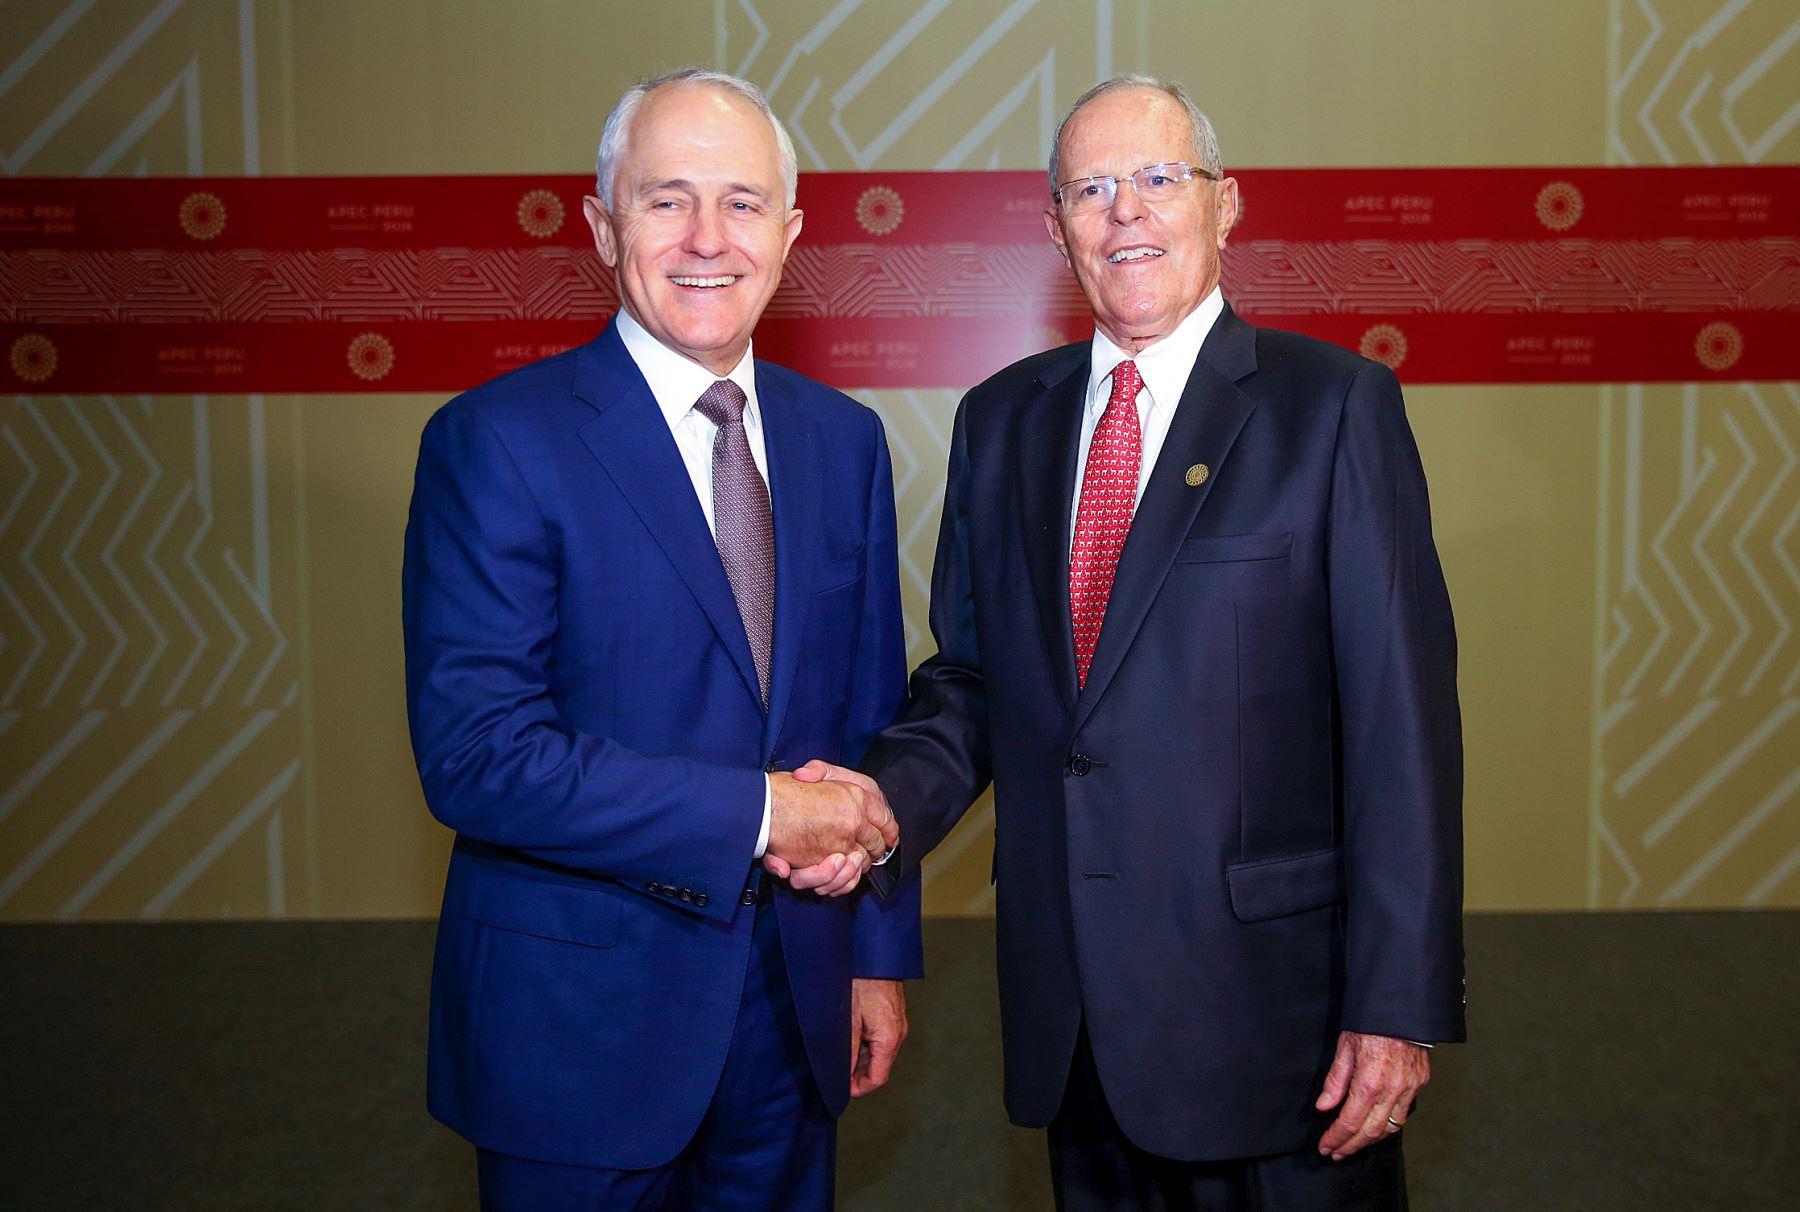 Presidente peruano Pedro Pablo Kuczynski y el  Primer ministro de Australia, Malcolm Turnbull. ANDINA/Prensa Presidencia